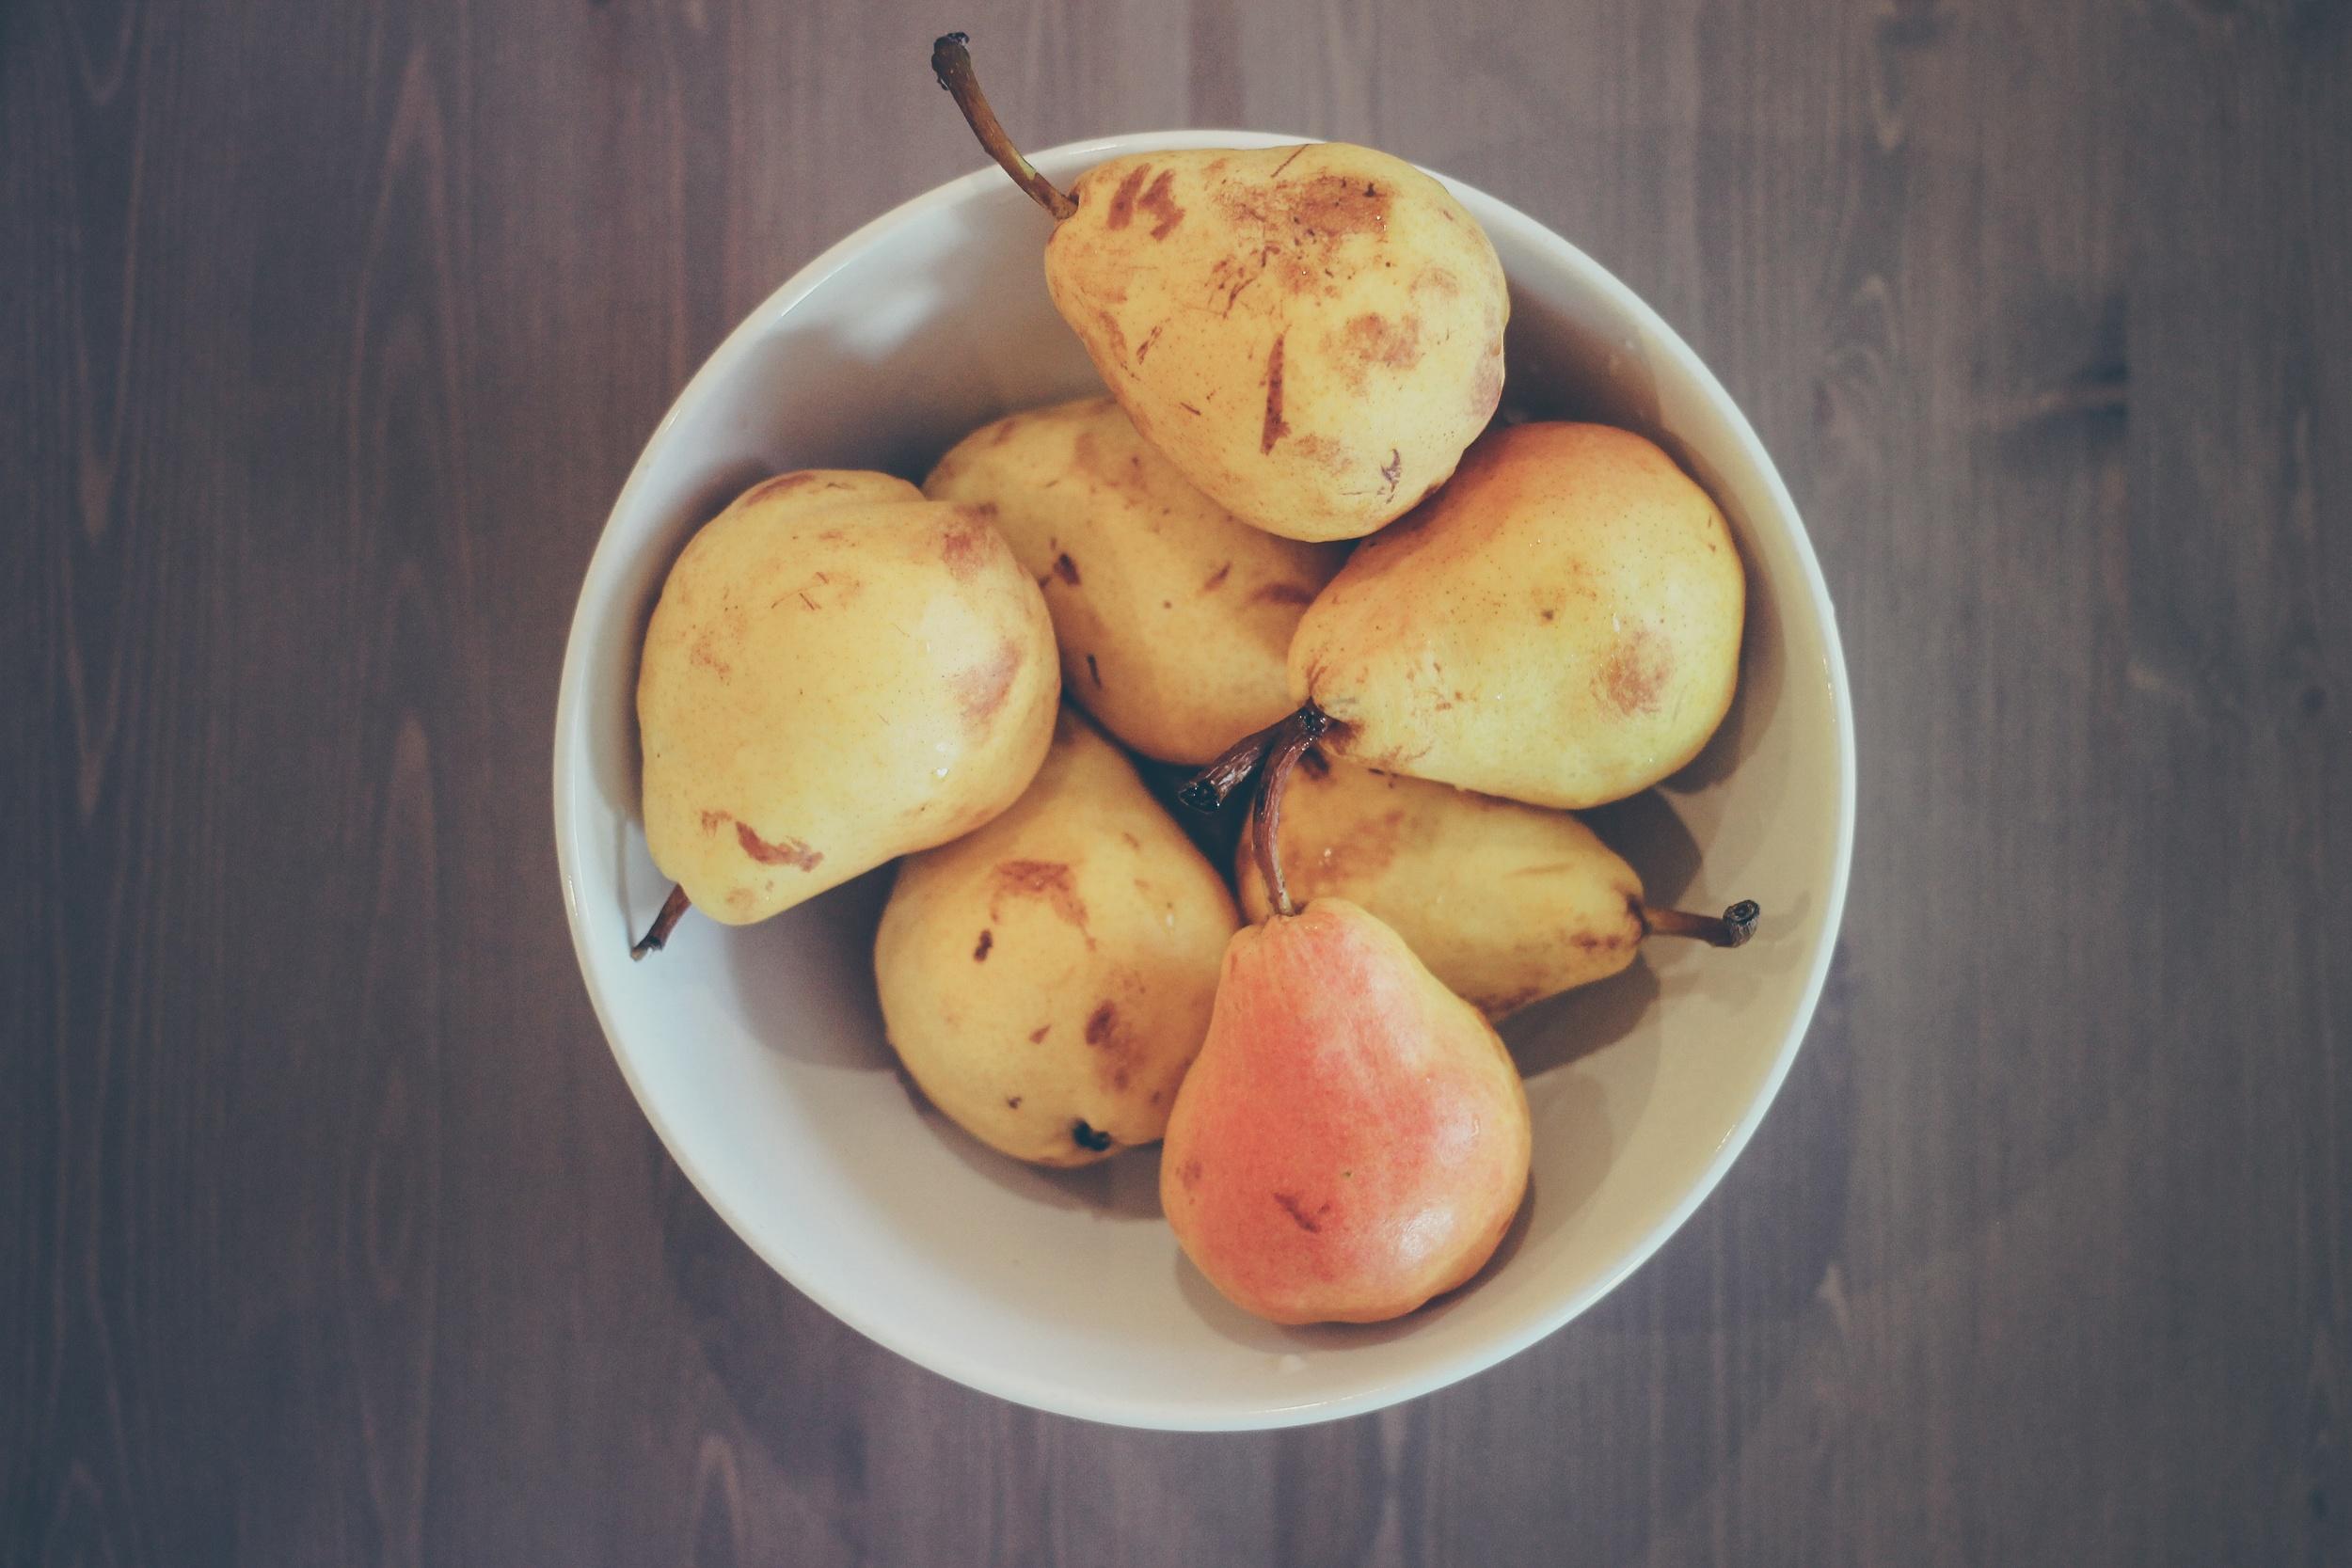 pears in a bowl.jpg